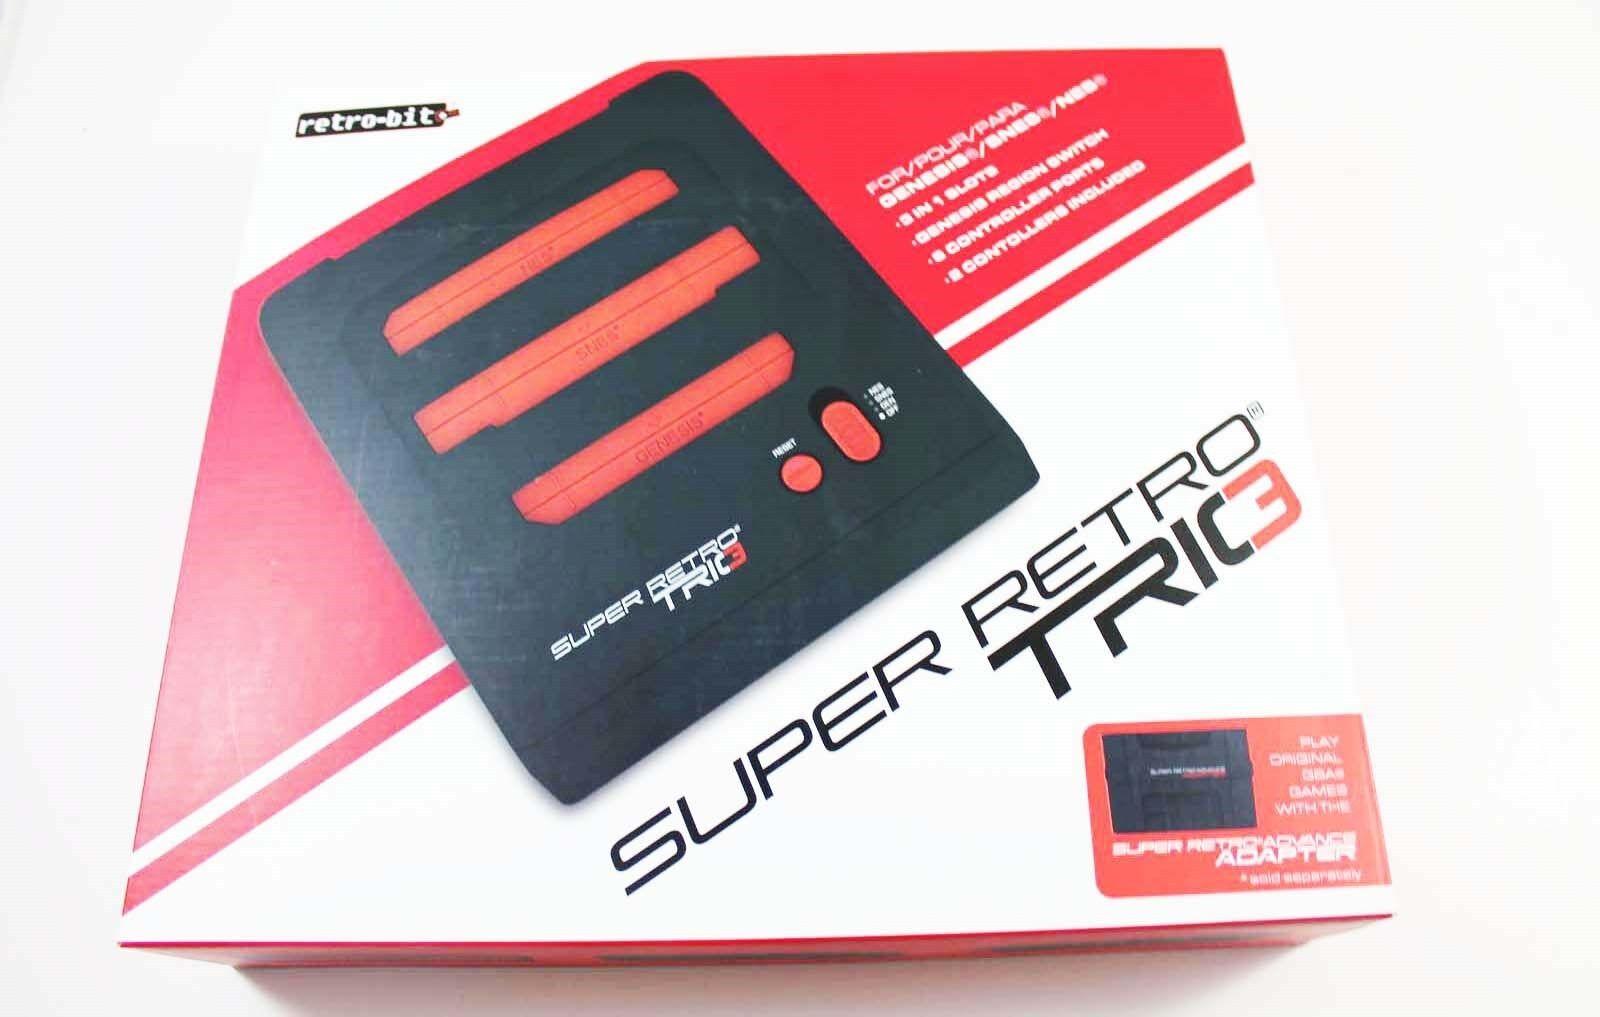 Retro-Bit Super RetroTRIO Console NES/SNES/Genesis 3-In-1 Sy